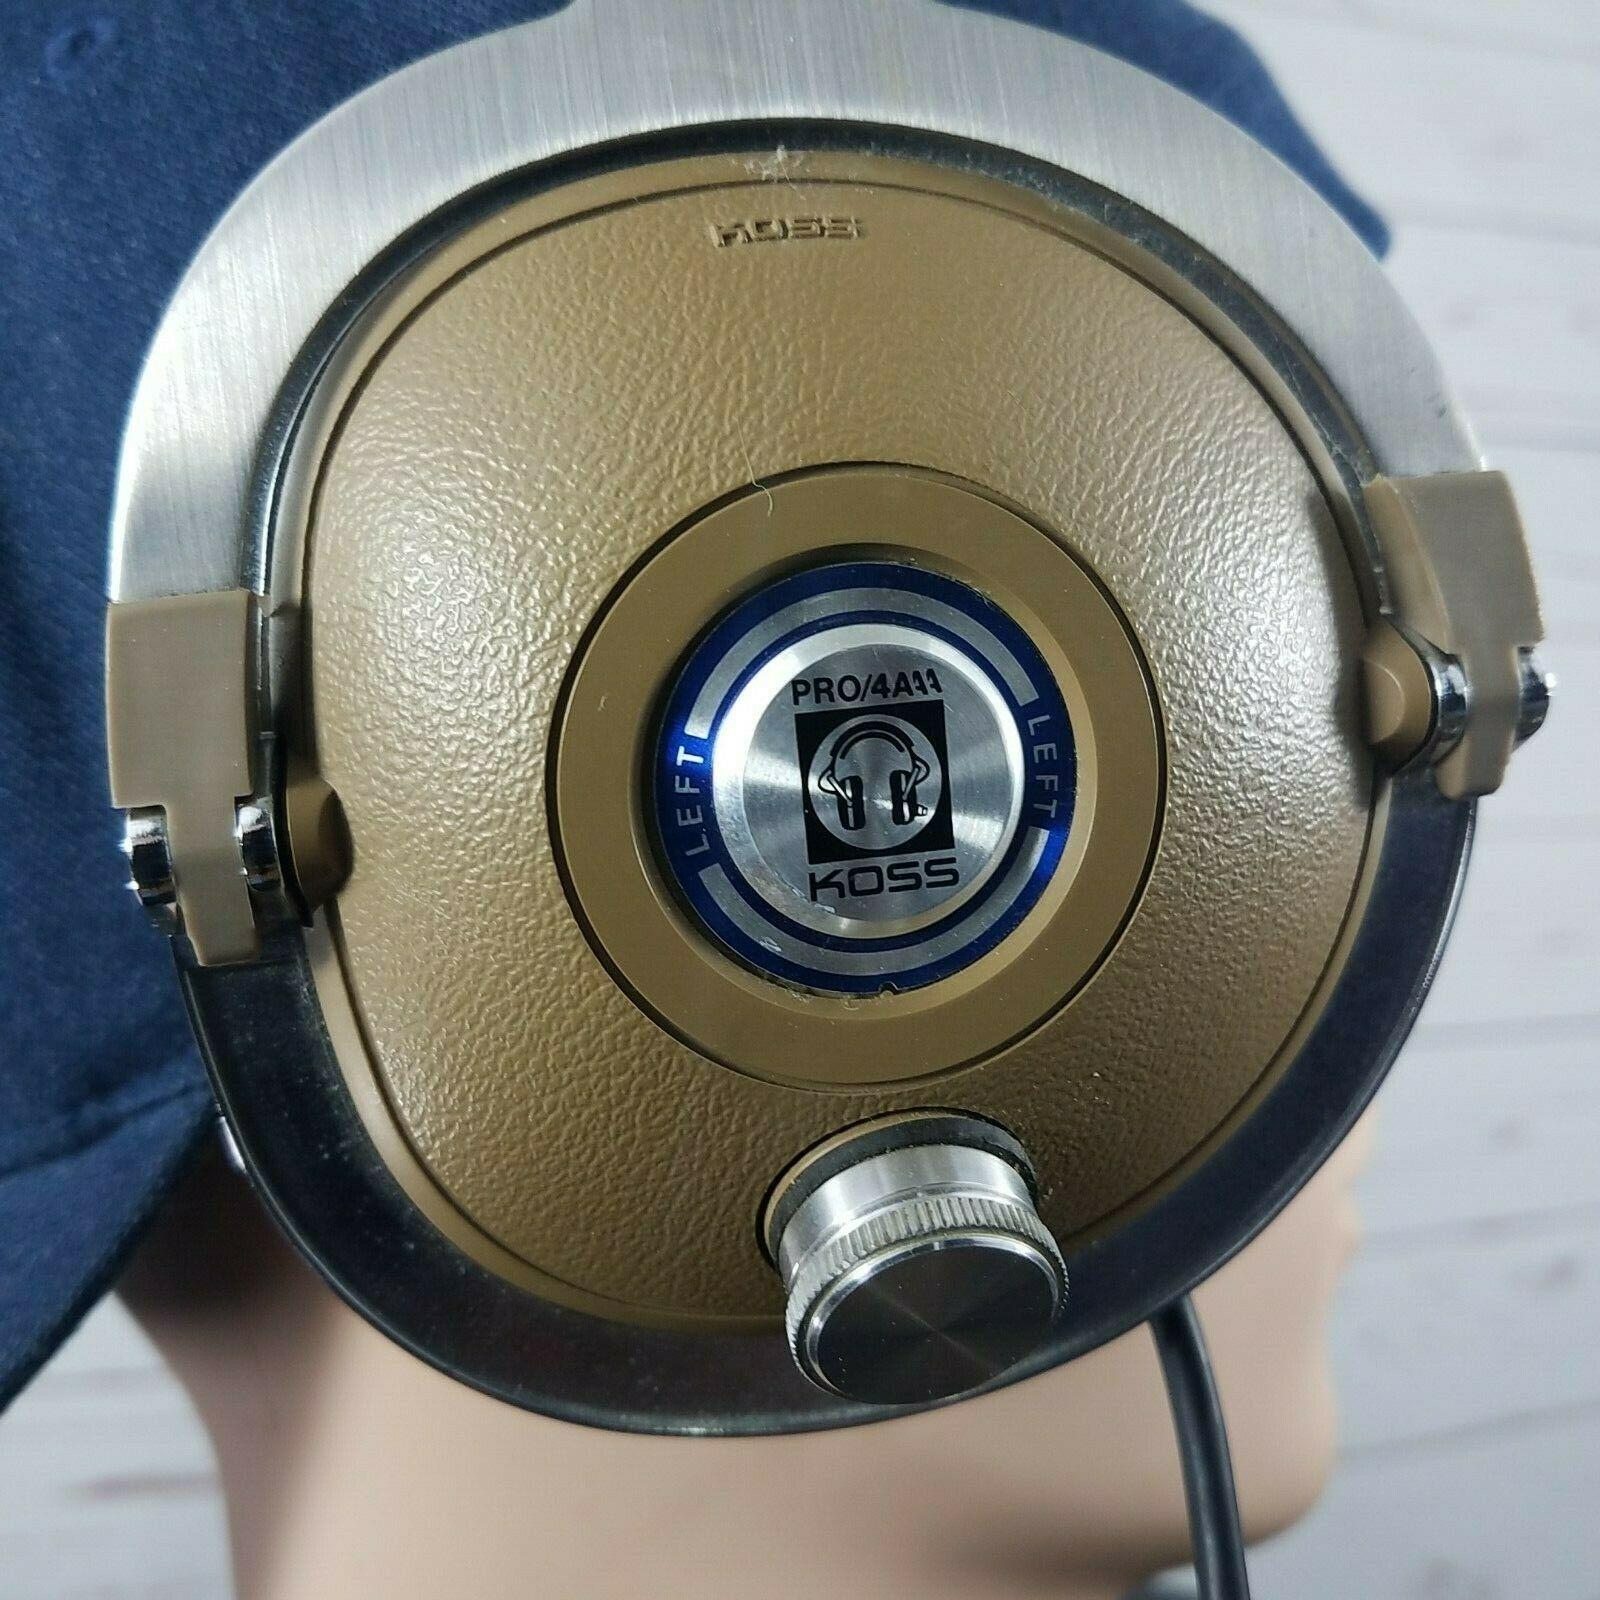 Koss Headset PRO/4AAA Vintage 70s Headphones TESTED!